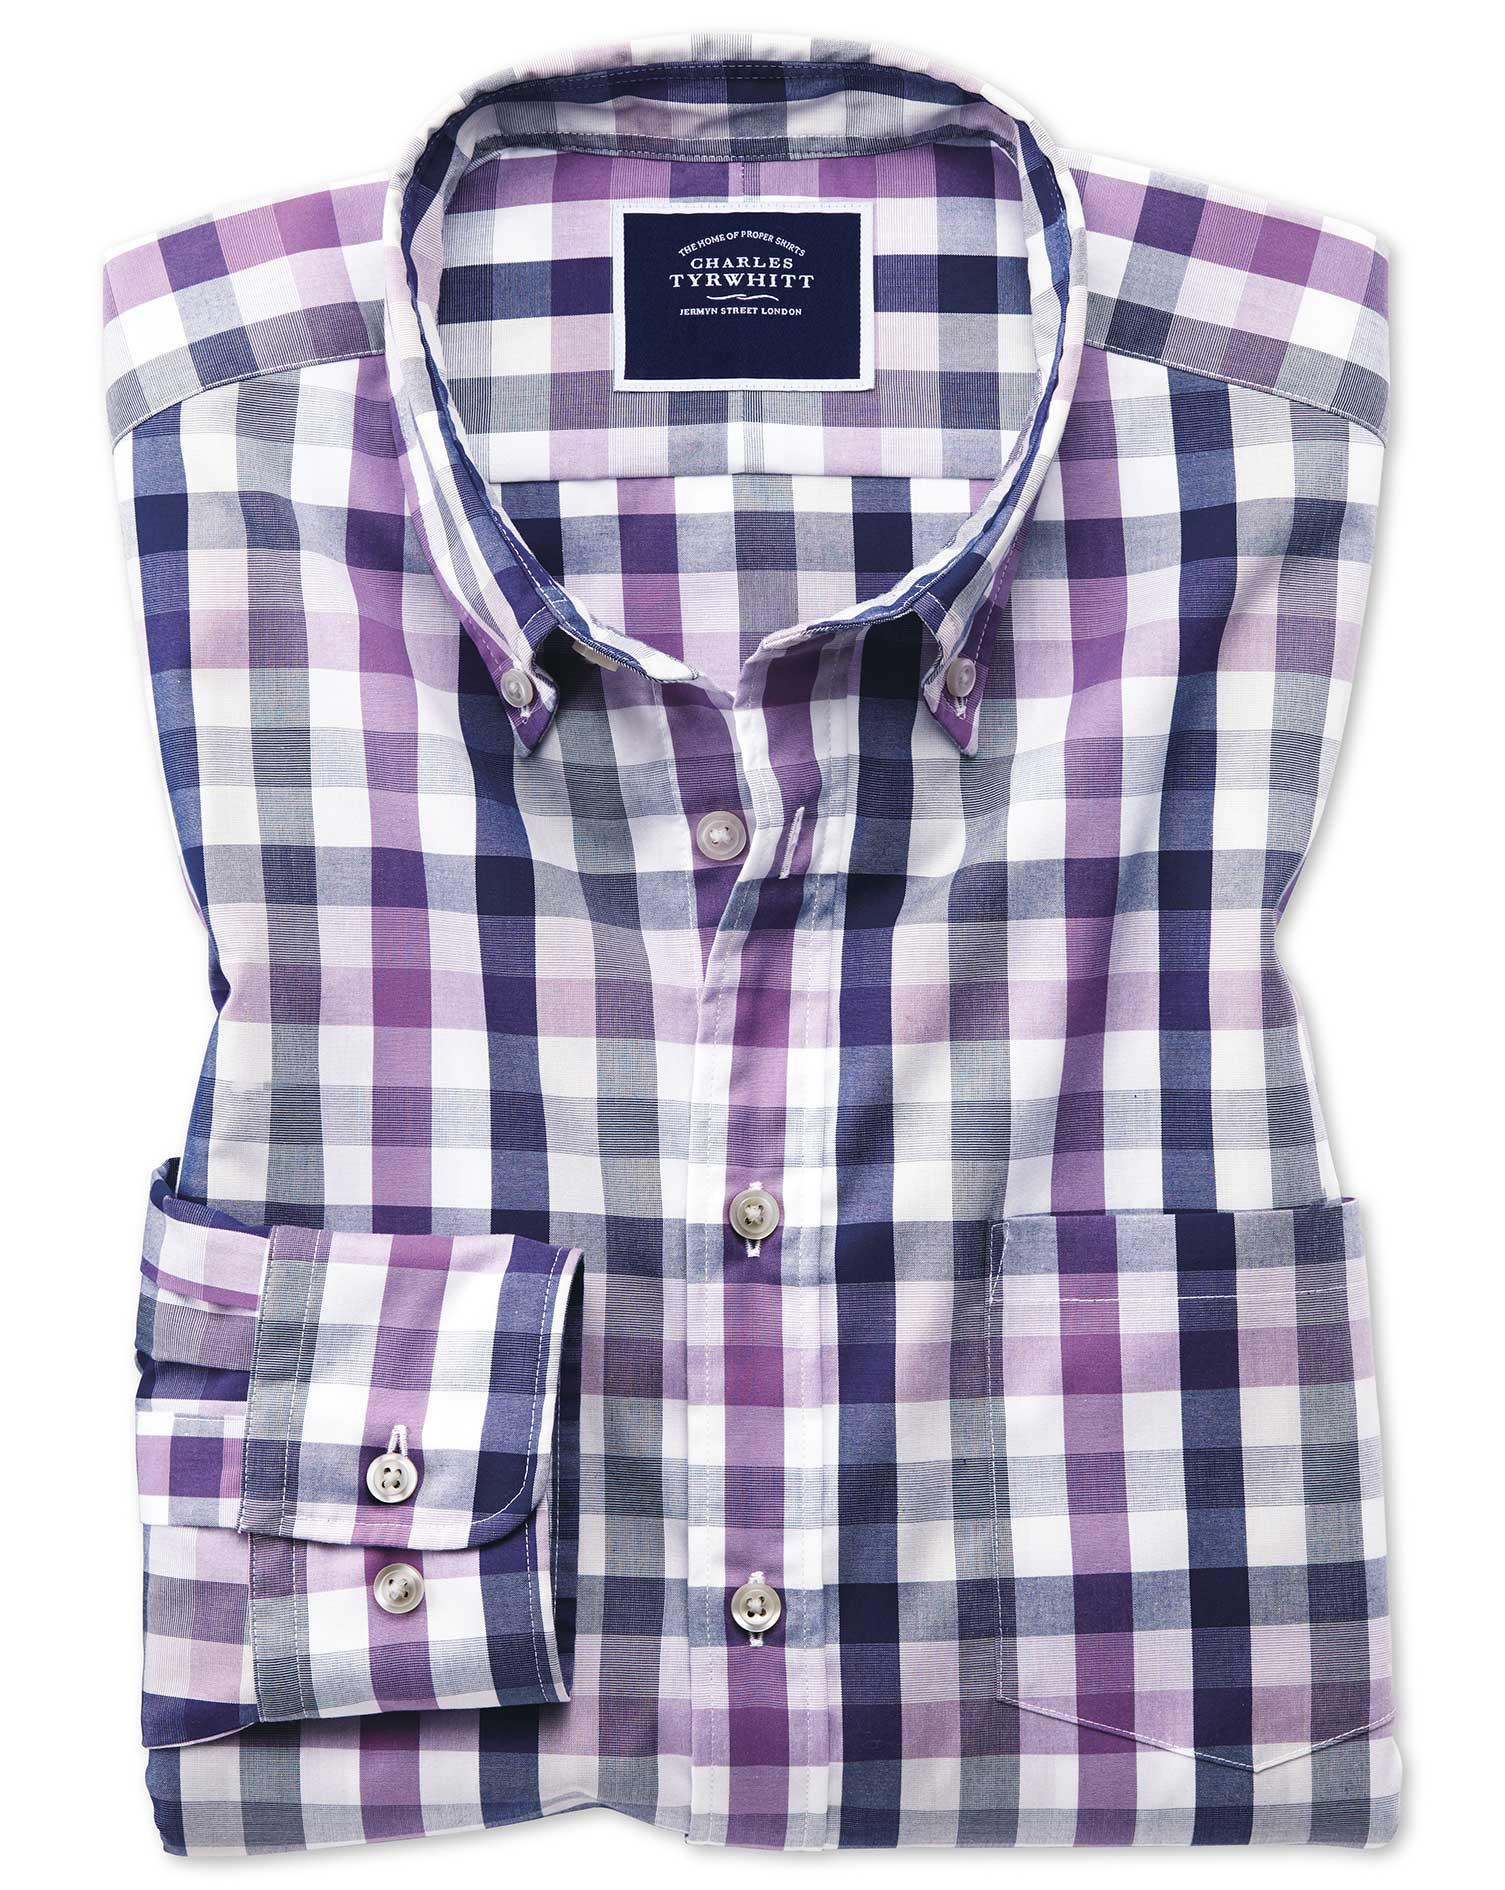 Classic Fit Purple Multi Check Soft Washed Non-Iron Tyrwhitt Cool Cotton Shirt Single Cuff Size Smal